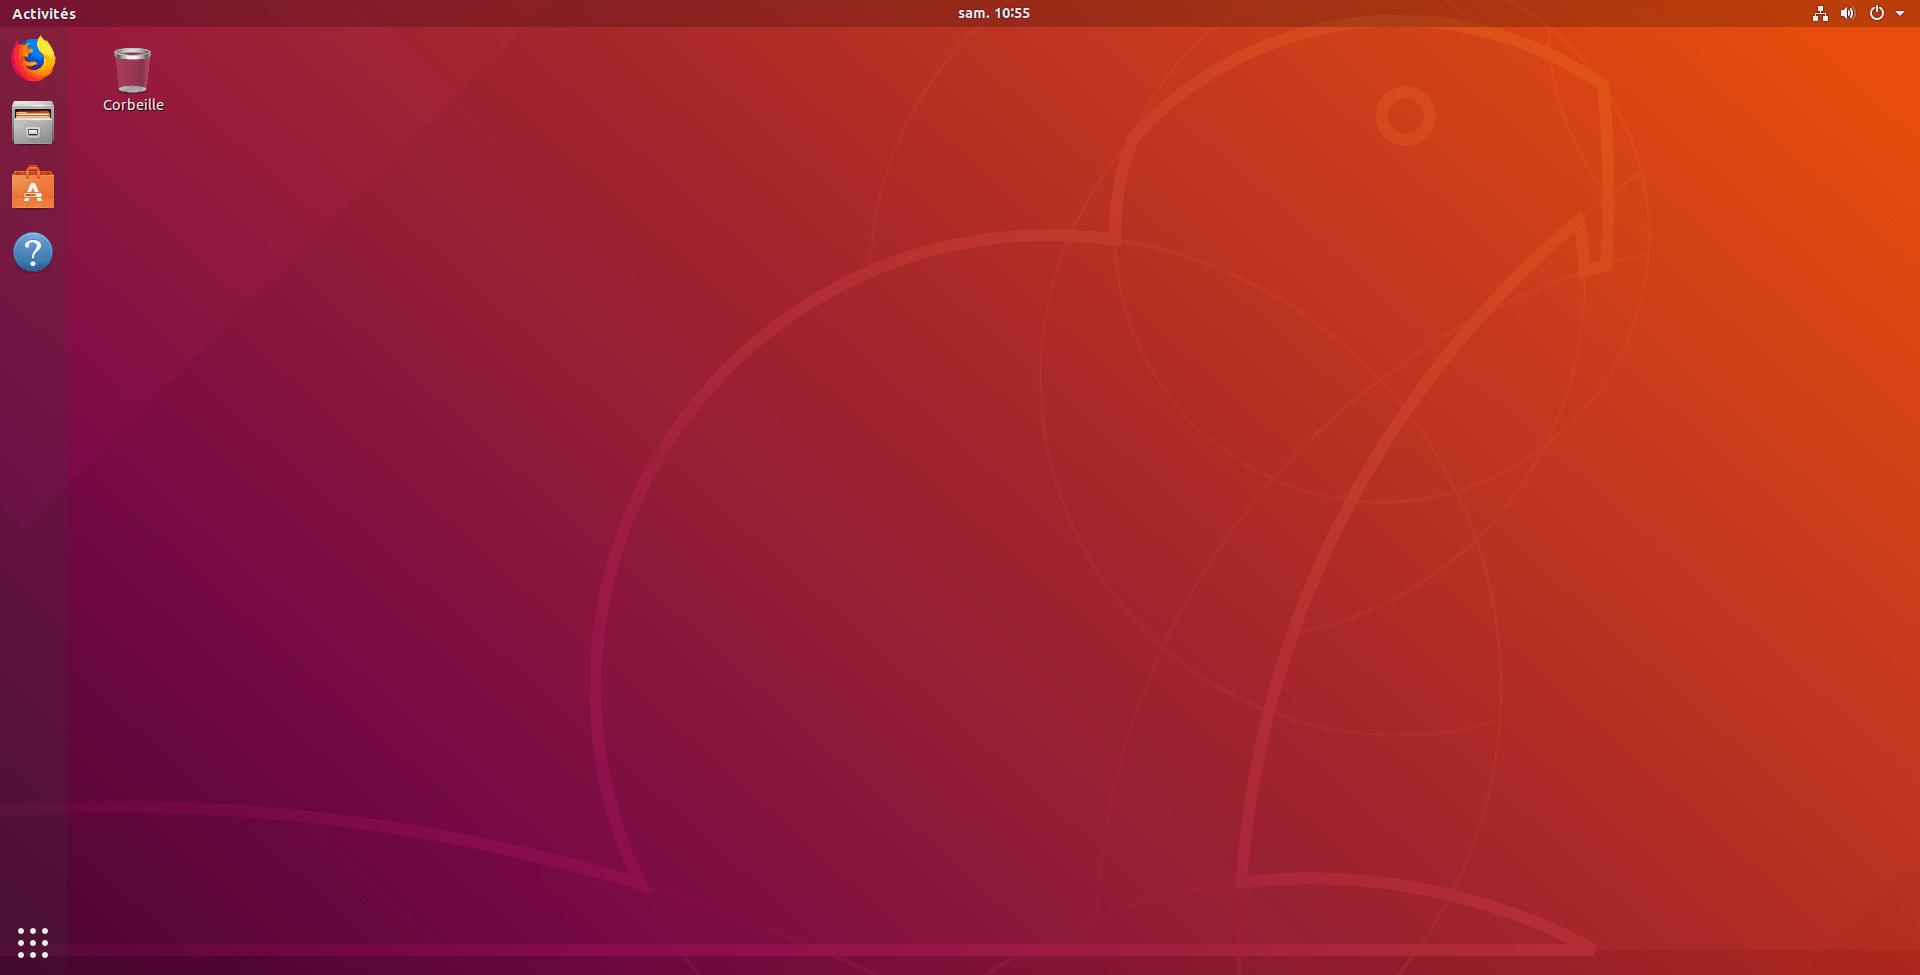 Installer ubuntu 18.04 lts en dual boot avec windows 10 u2013 le crabe info